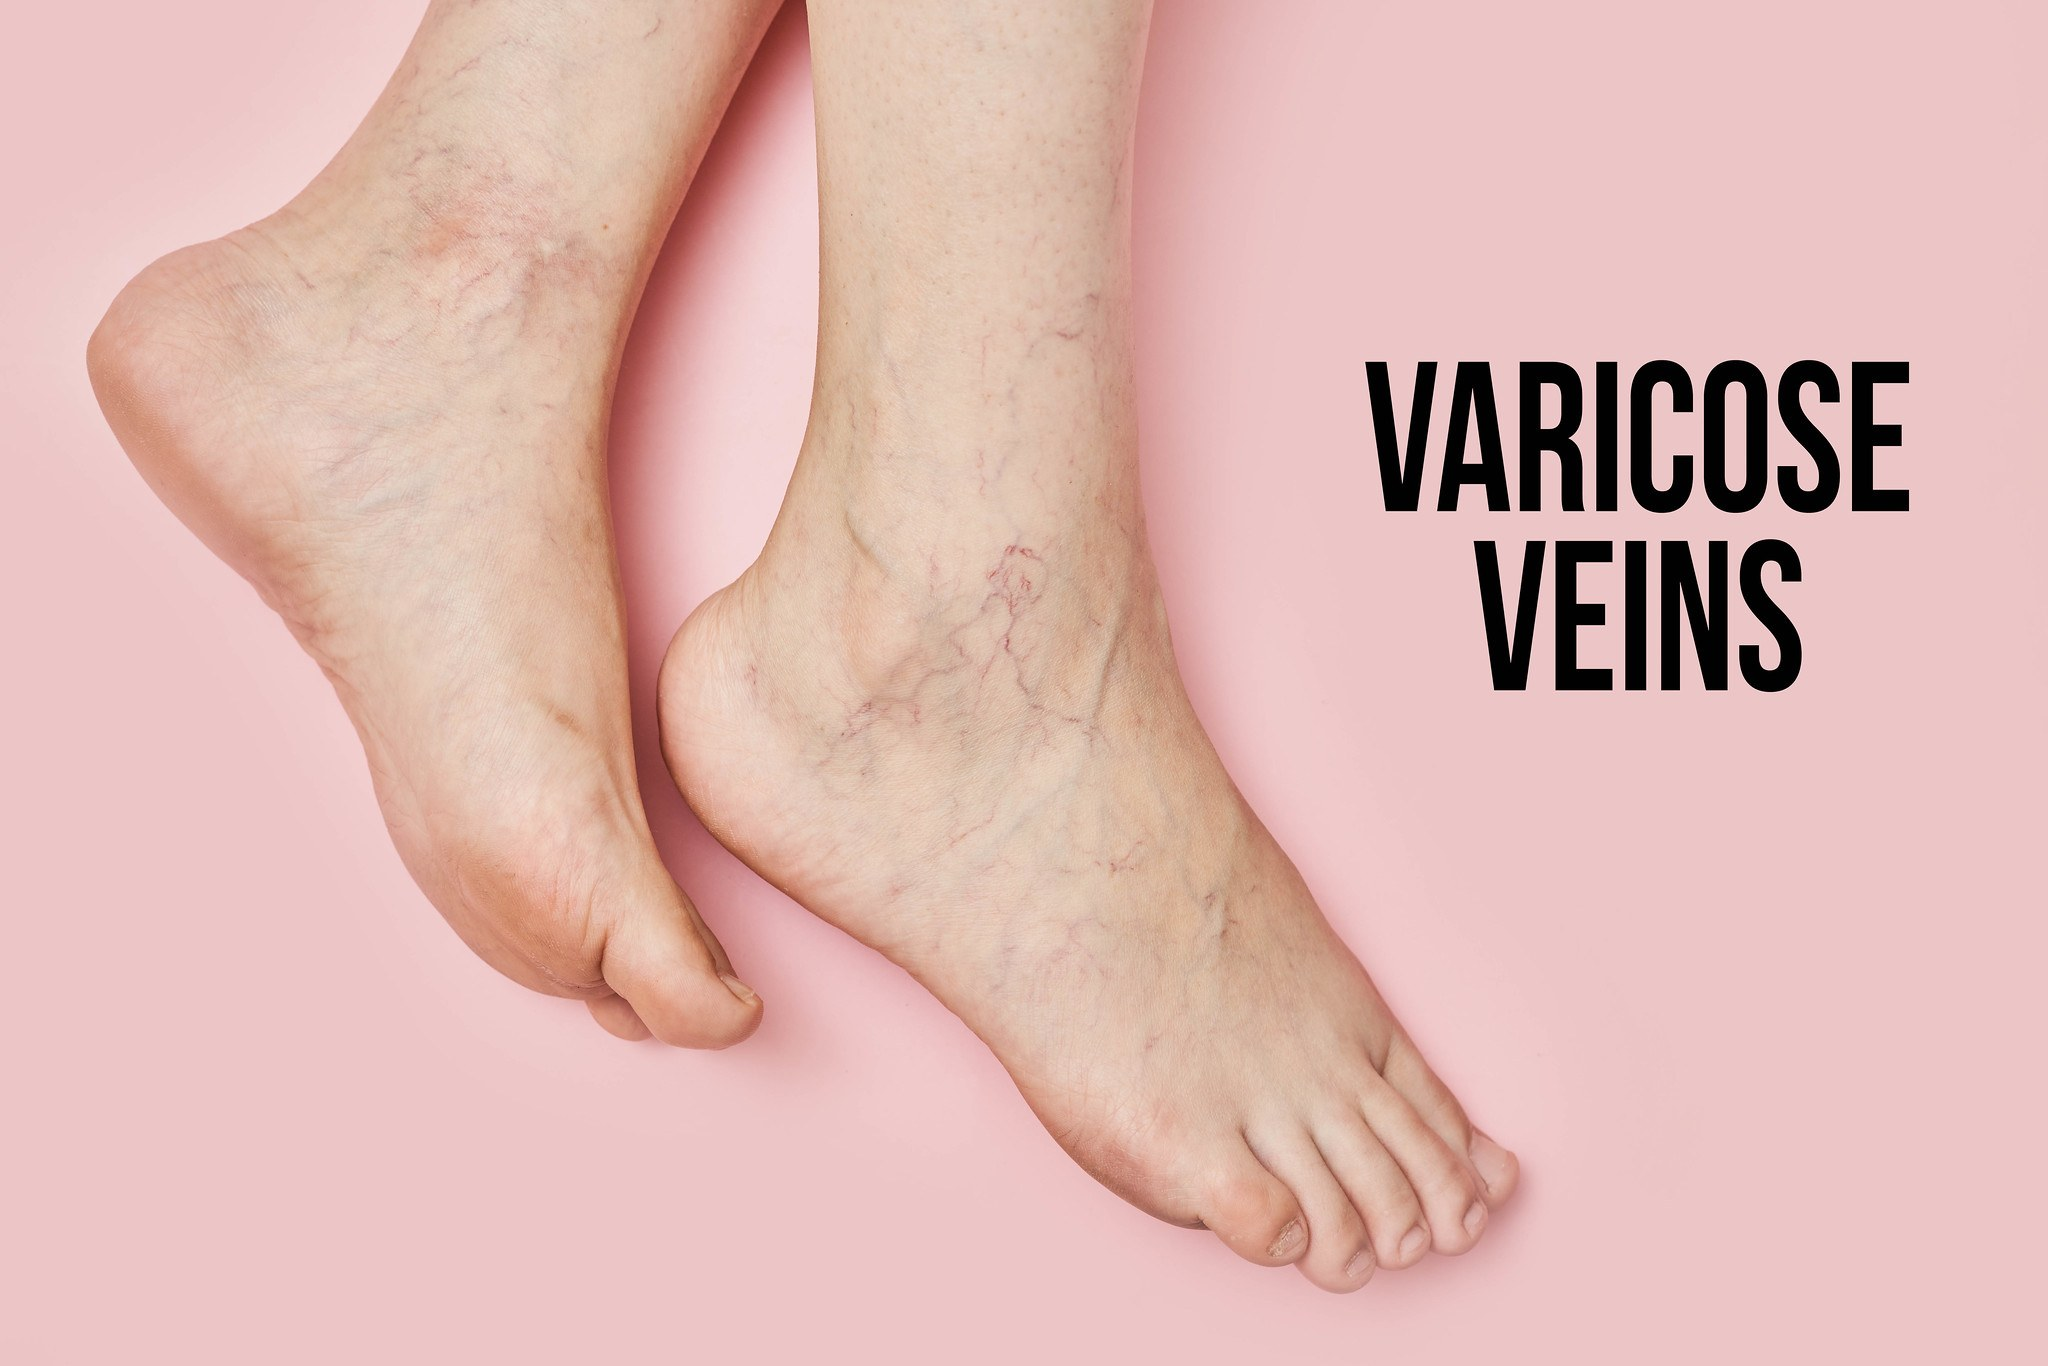 Here's What Varicose Veins Looks Like